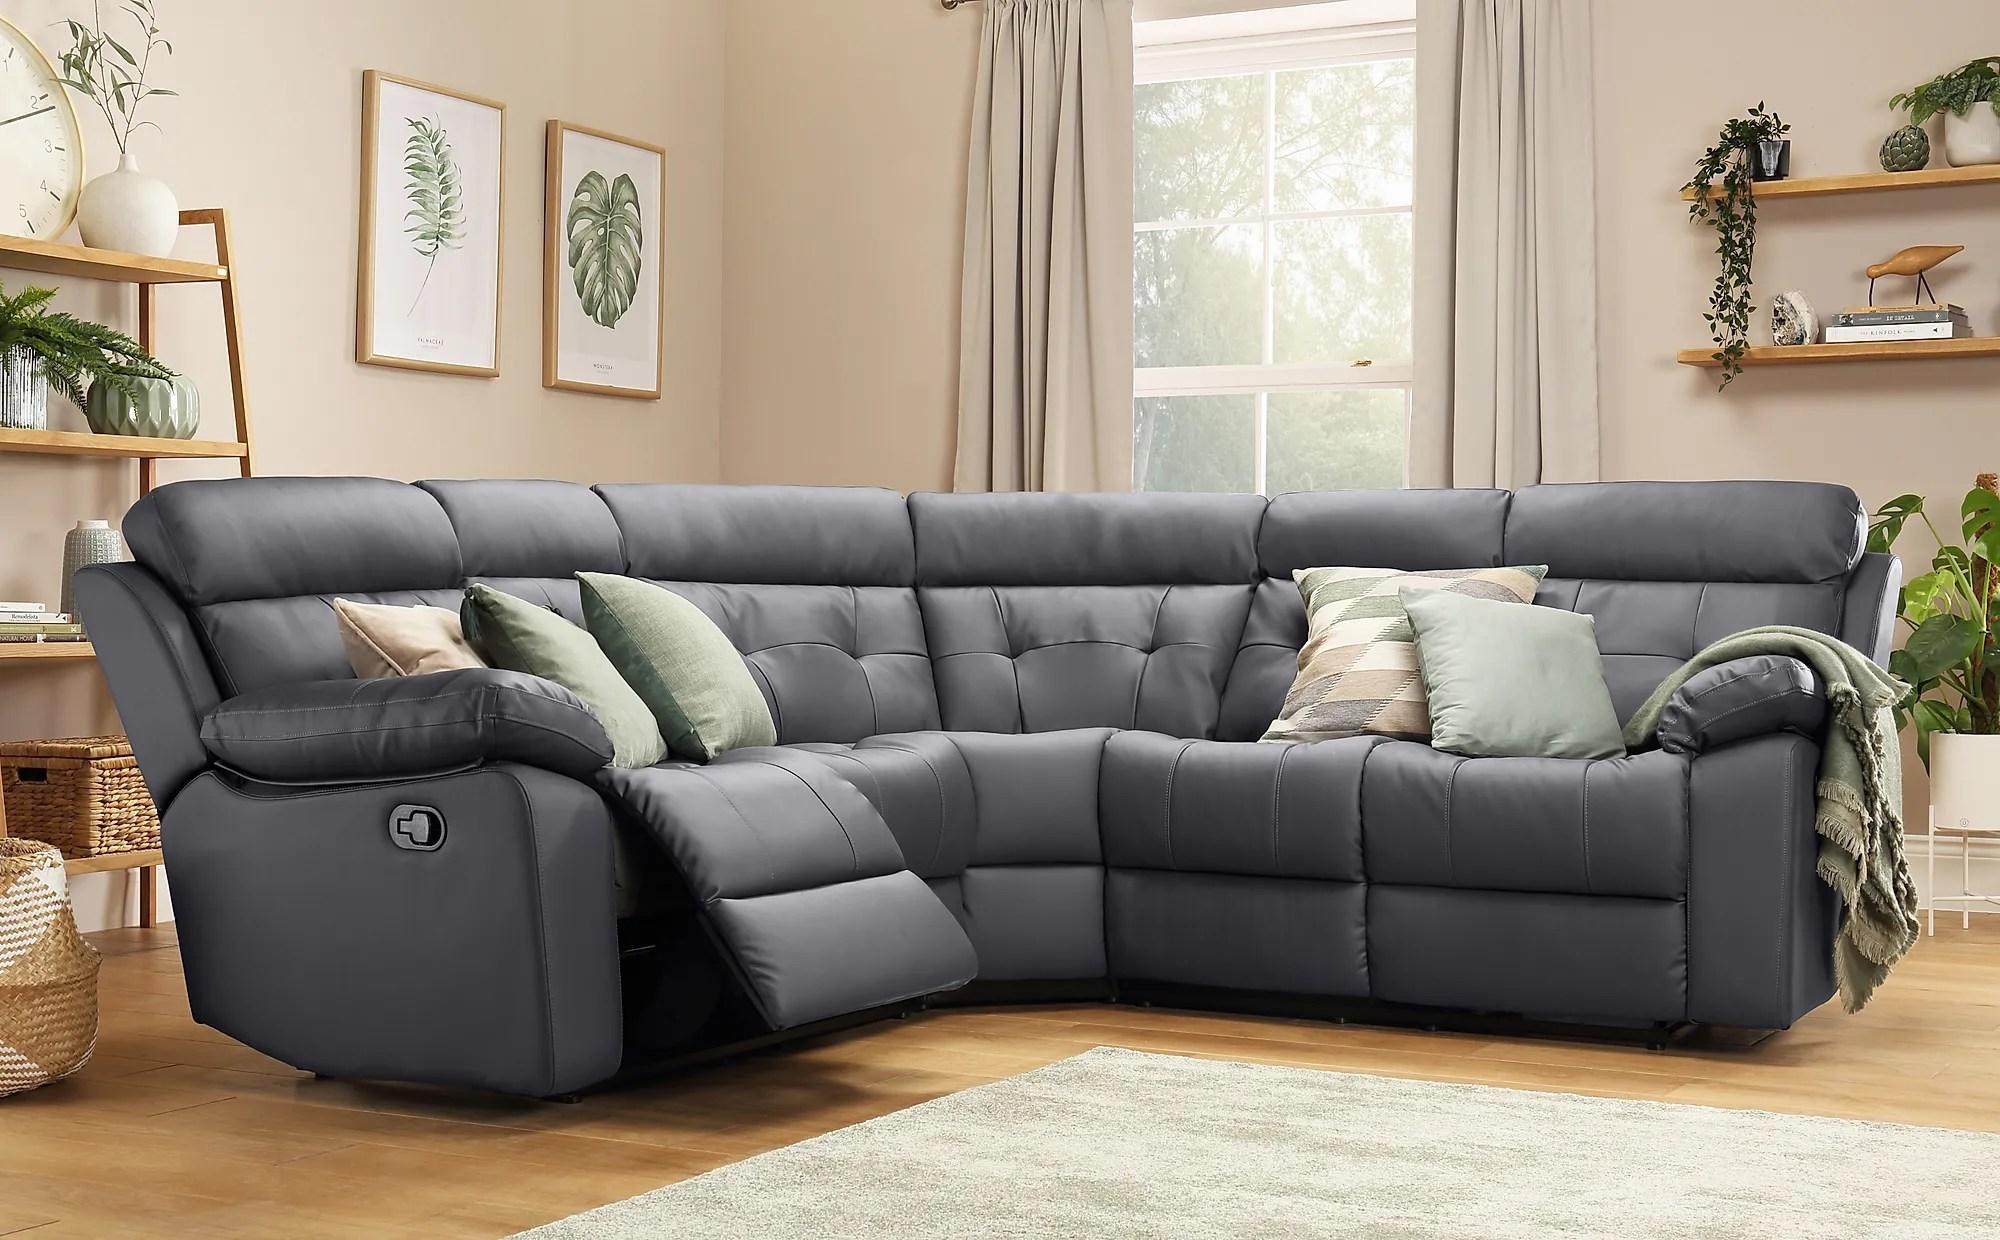 Grosvenor Grey Leather Recliner Corner Sofa Furniture Choice